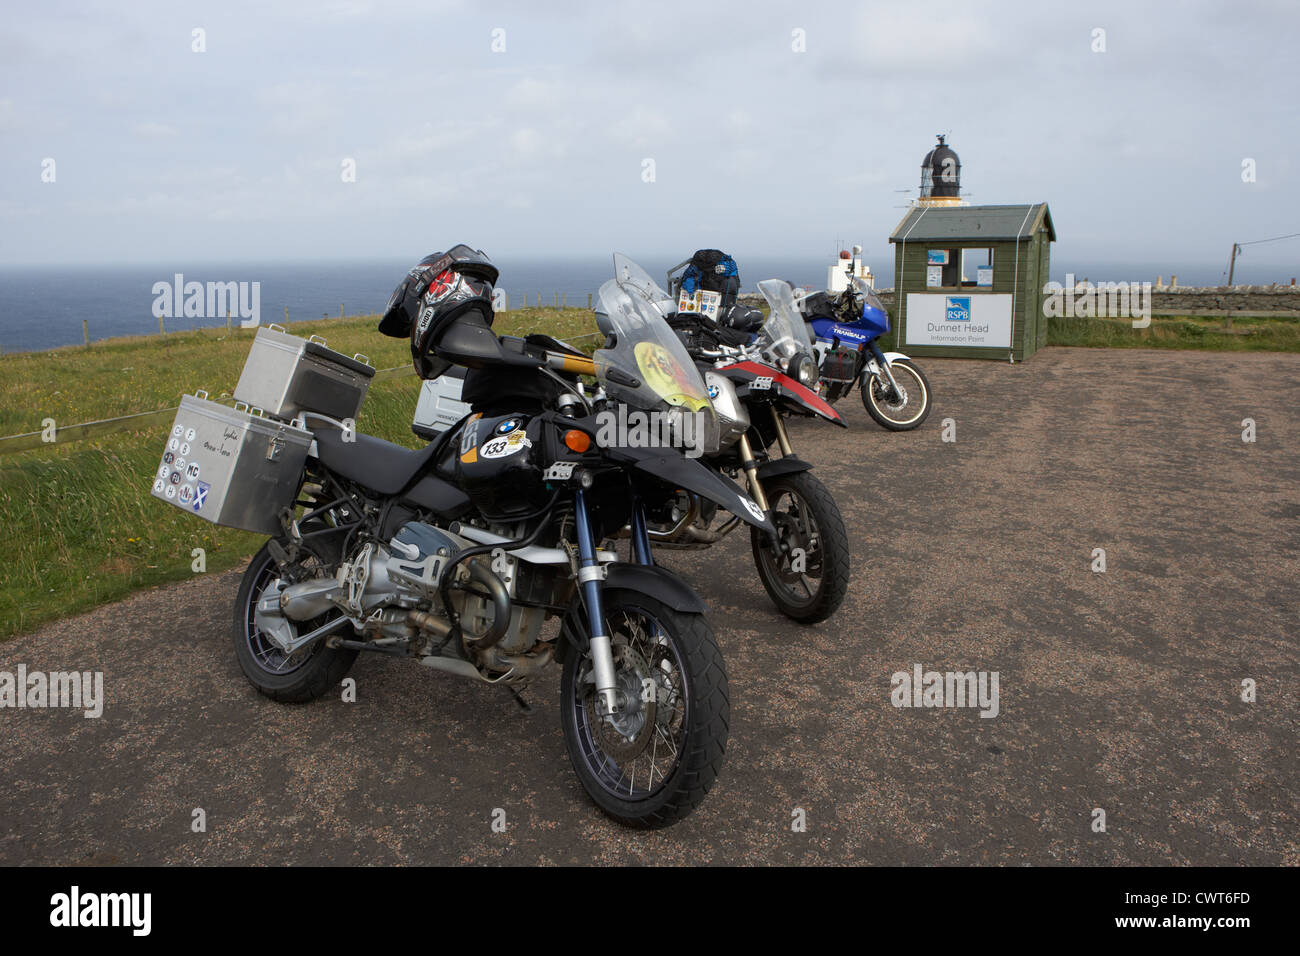 touring european motorcycles at dunnet head scotland uk - Stock Image